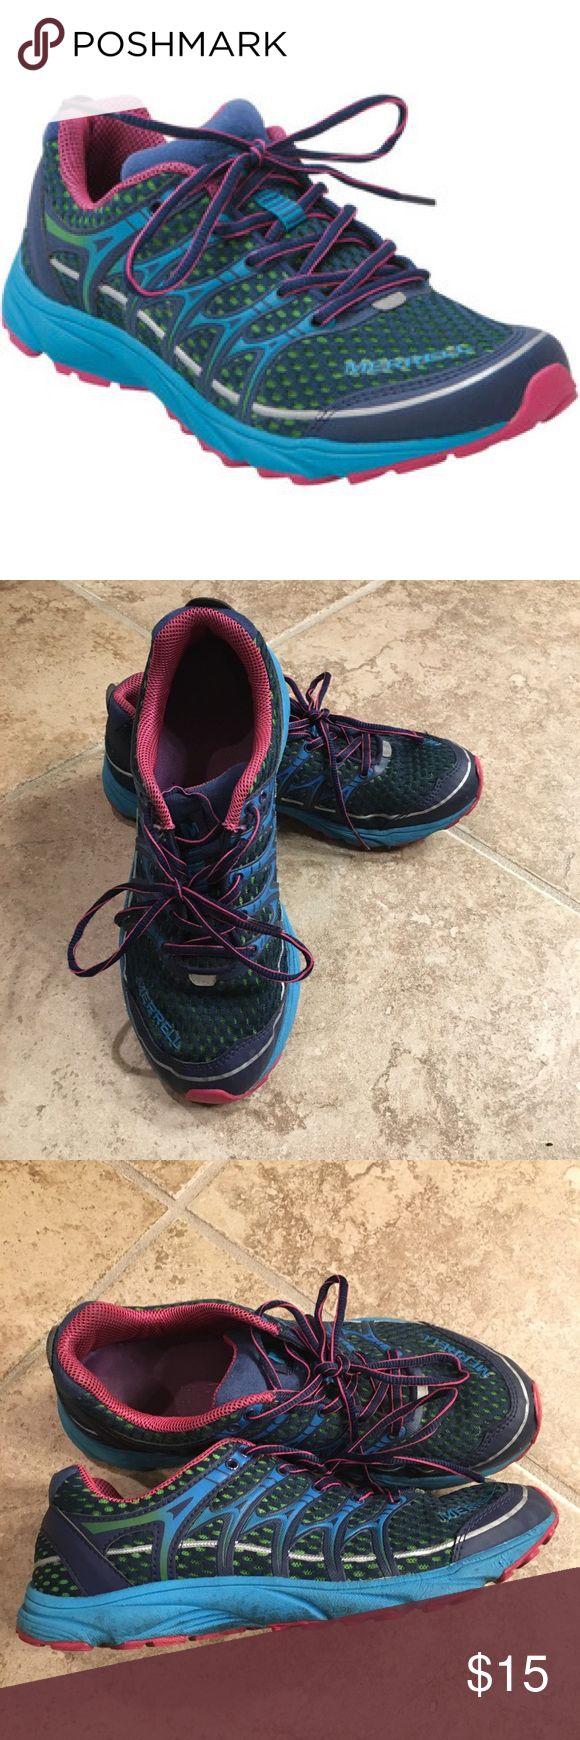 Spotted while shopping on Poshmark: Merrell Mix Master Move Glide Walking shoes! #poshmark #fashion #shopping #style #Merrell #Shoes